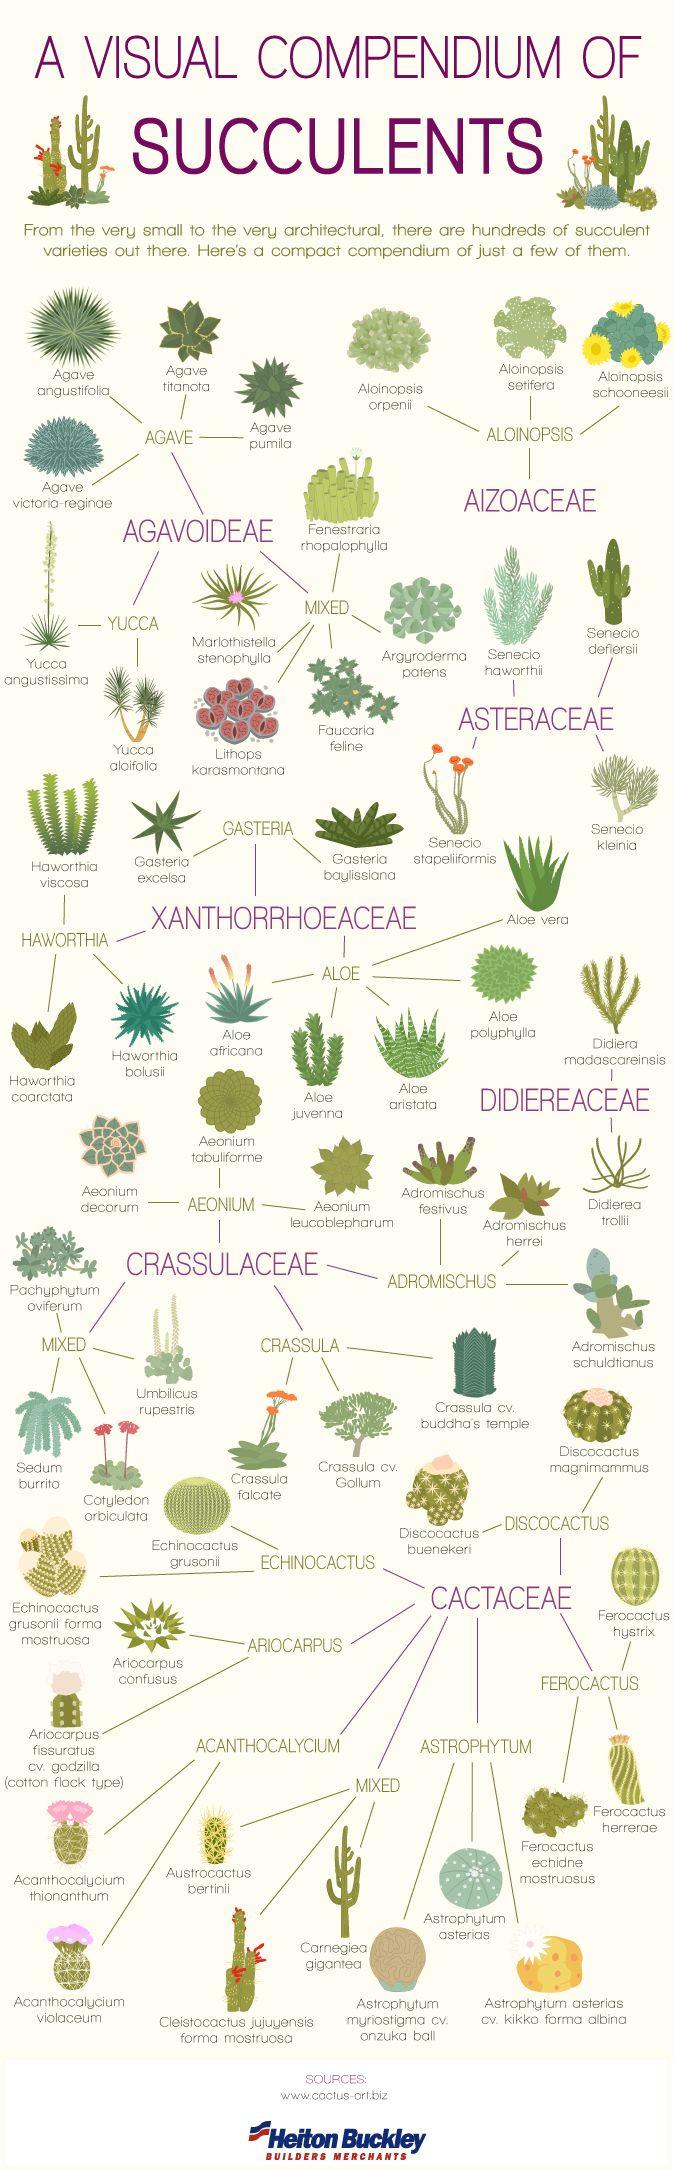 A Visual Compendium of Succulents by cactus.art.biz #Infographic #Succulents